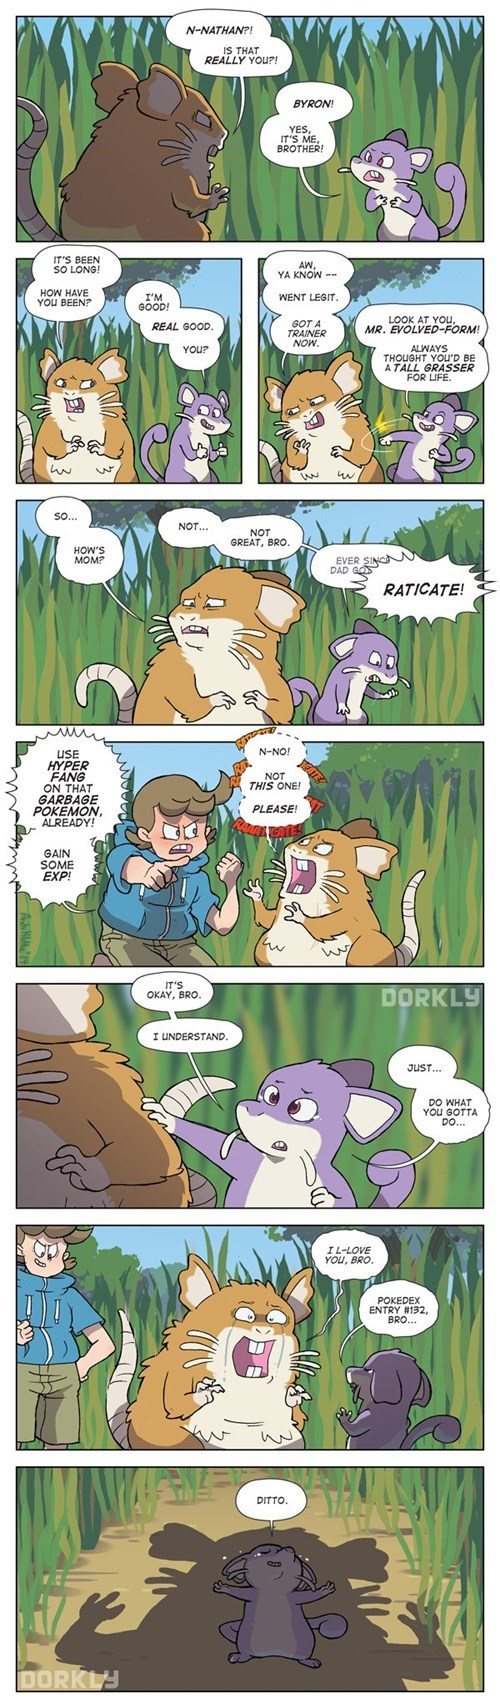 dorkly,Pokémon,rattata,web comics